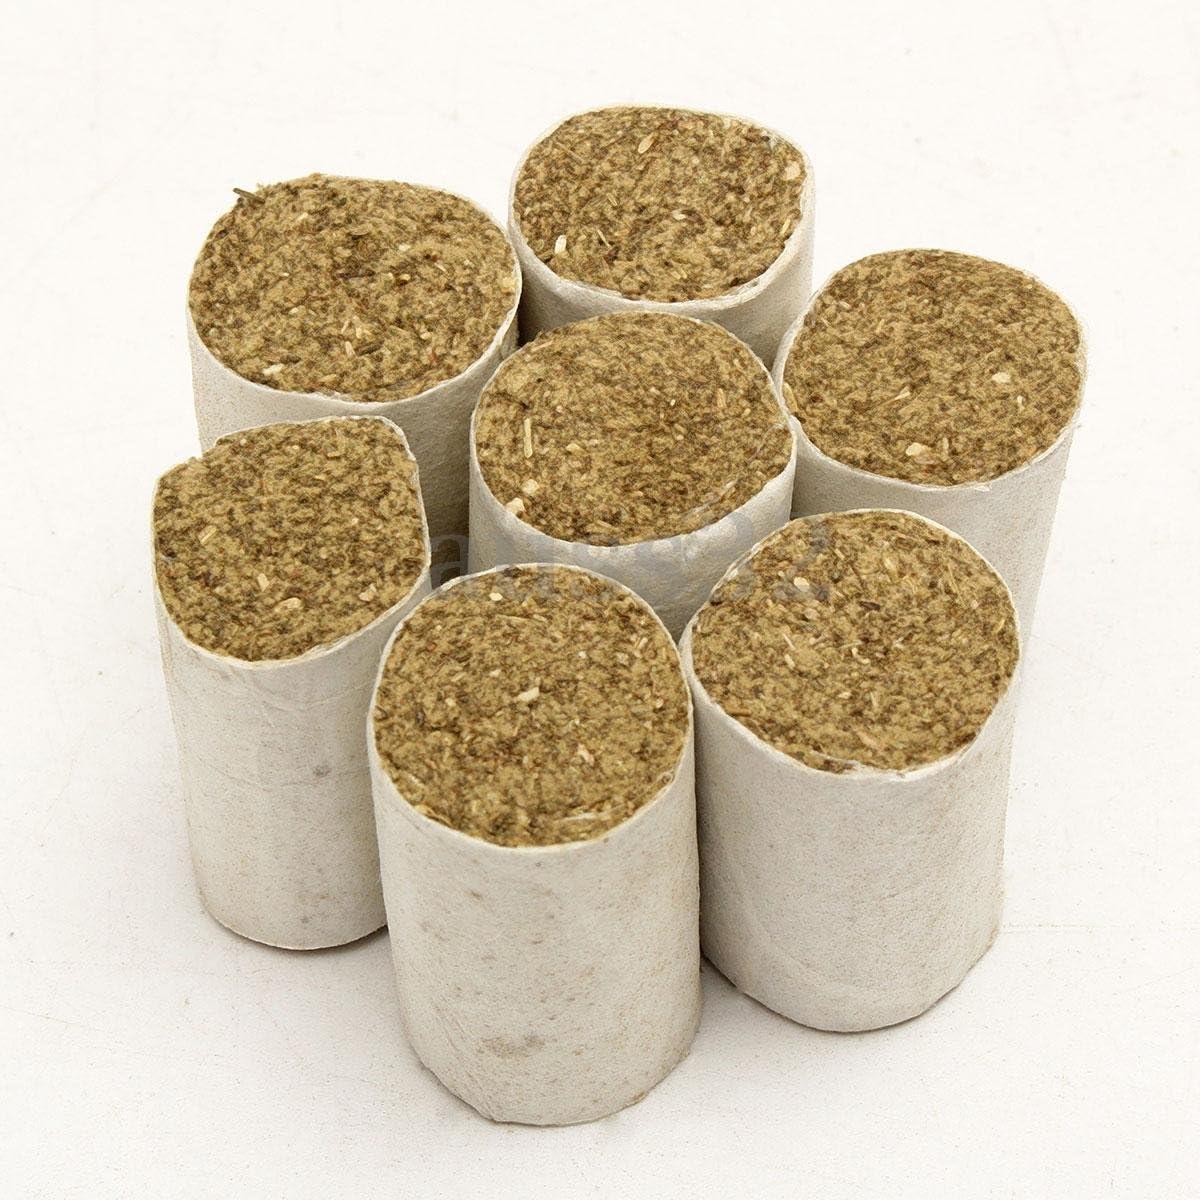 54pcs//bag Beekeeping Tools Beehive Fuel Chinese Herb Smoke Honey Made Deco